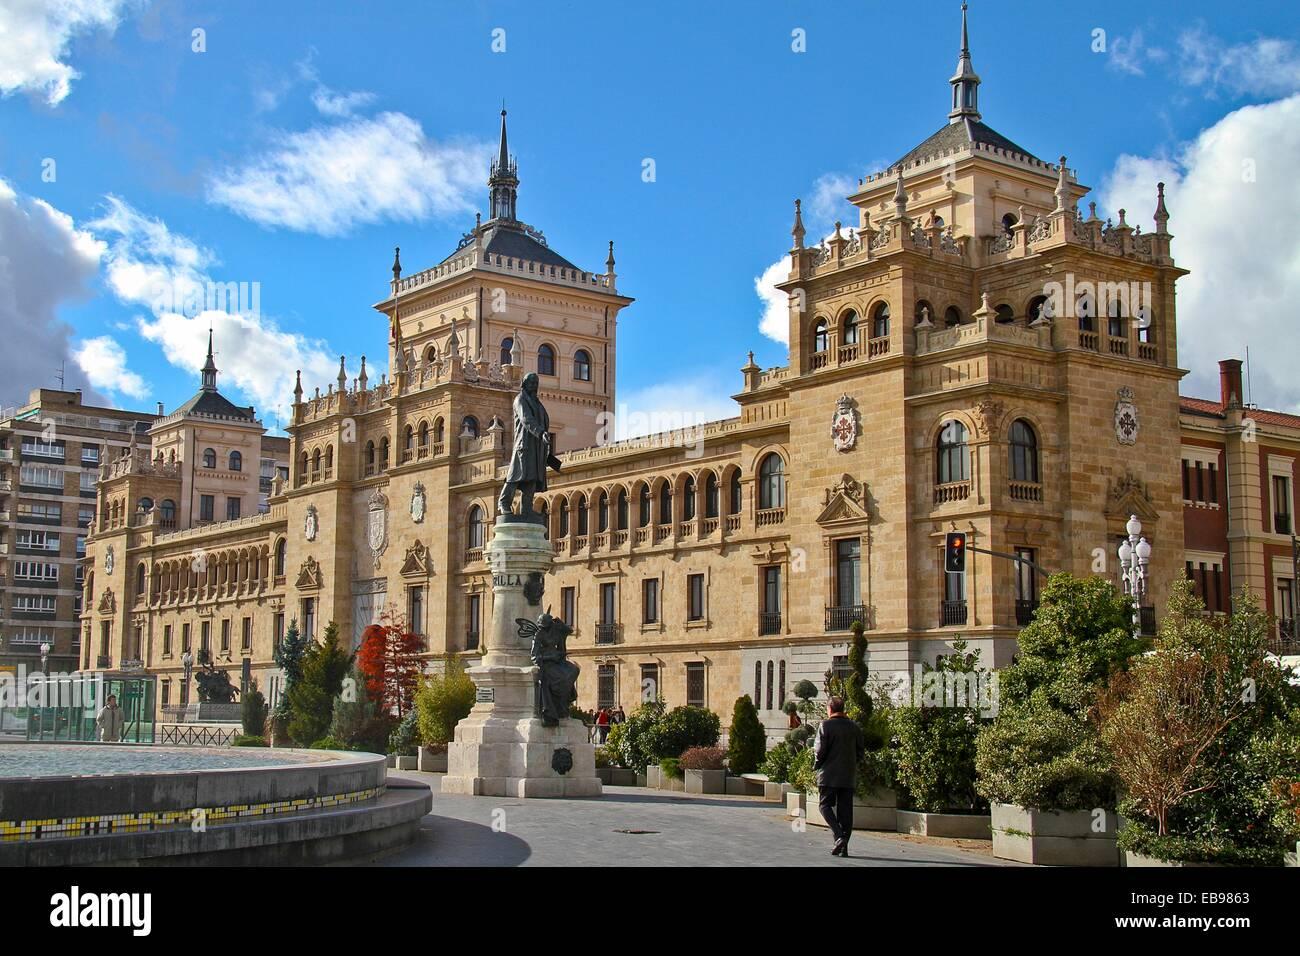 Plaza de Zorrilla, Academia de Caballeria, Valladolid, Castile and León, Spain - Stock Image